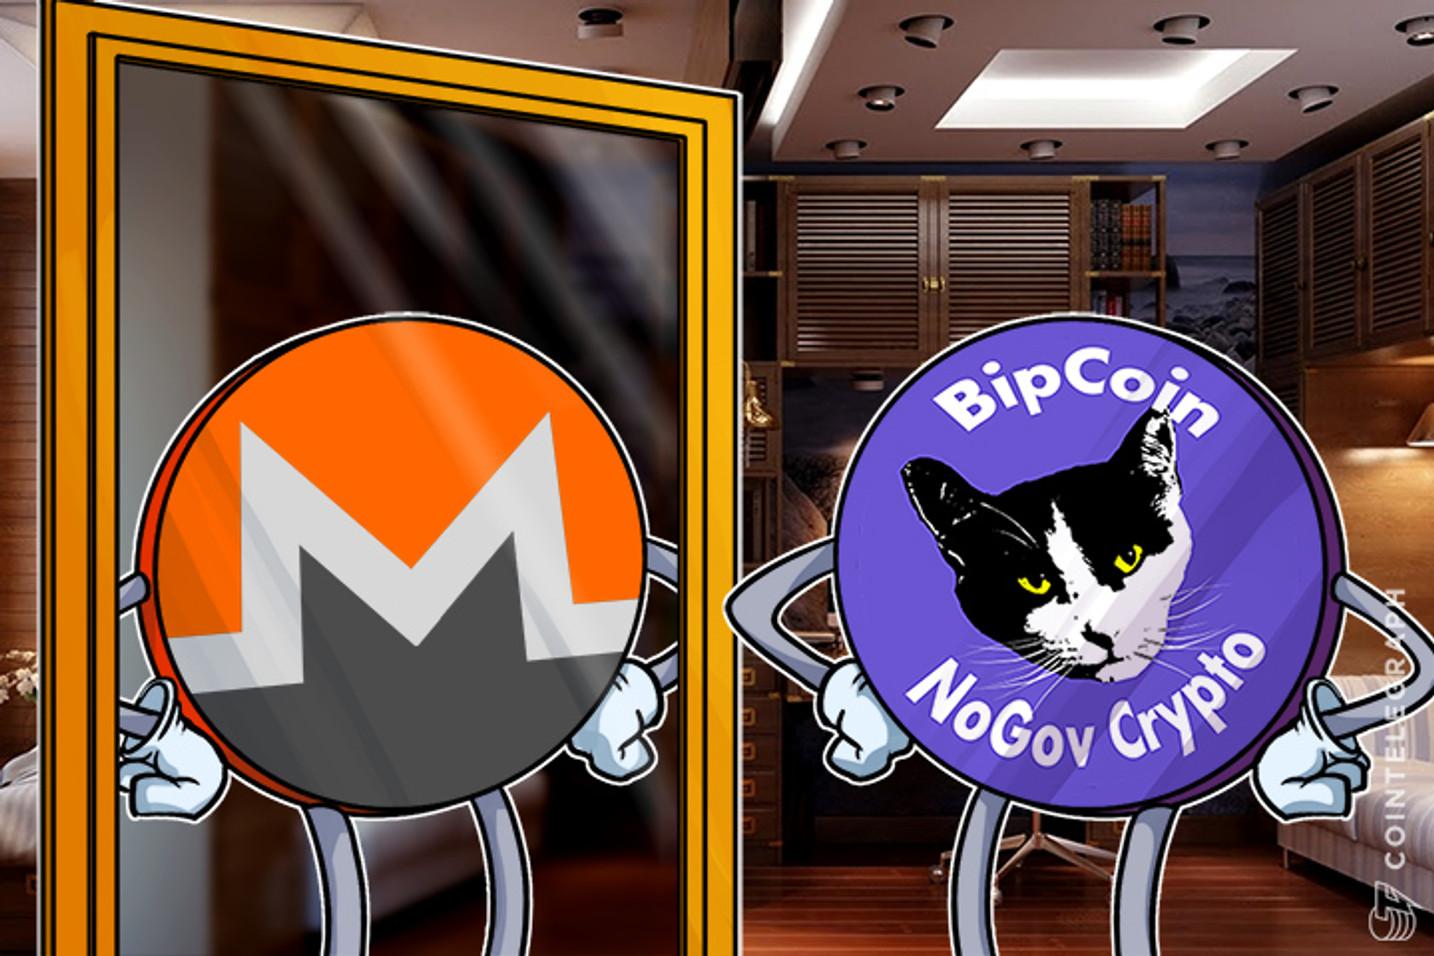 BipCoin, CryptoNote-Based Coin, Debuts GUI Wallet Before Monero